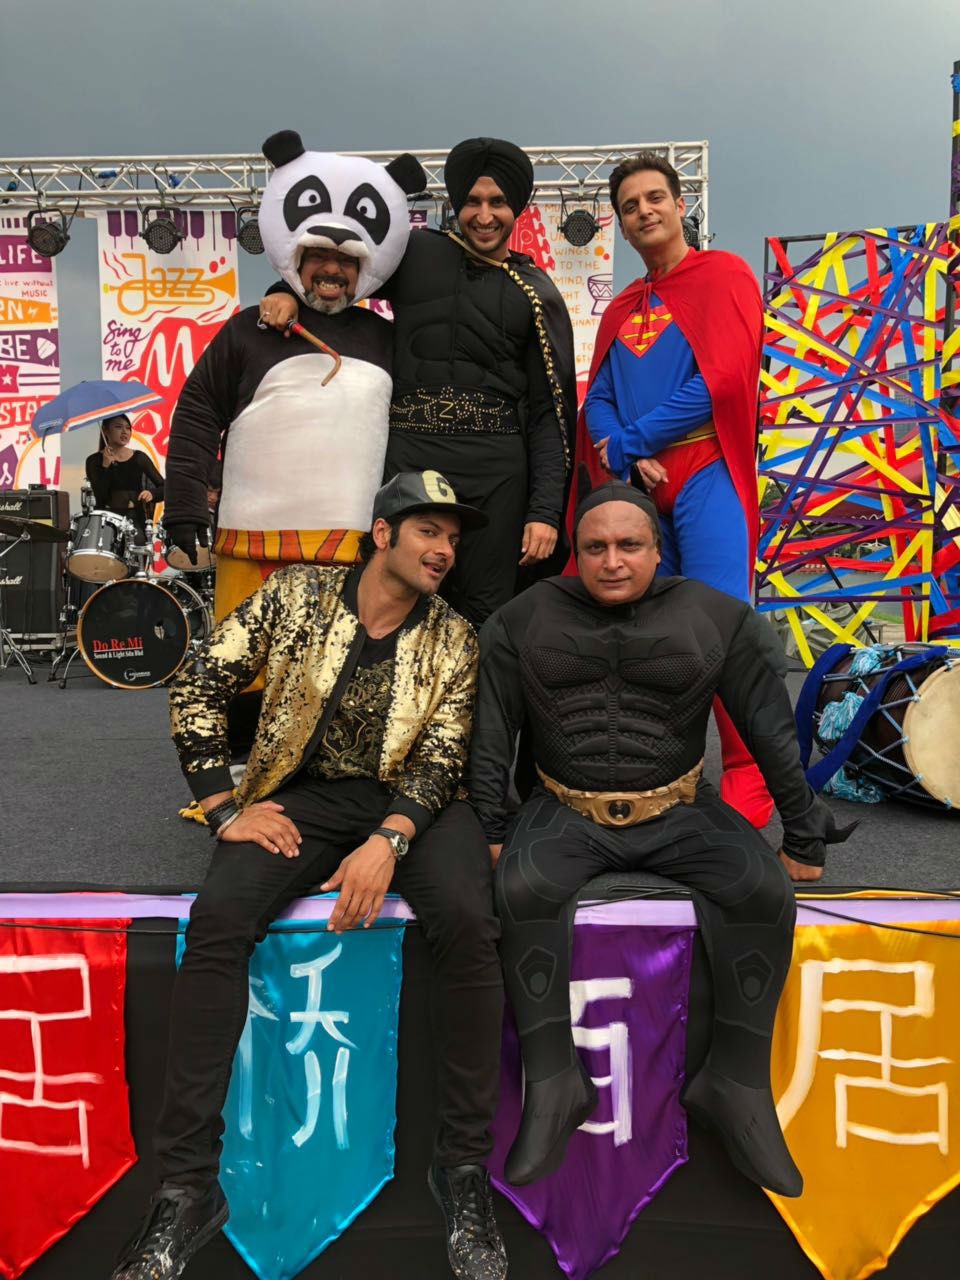 Diana Penty,Abhay Deol,Ali Fazal,Jimmy Shergill,Happy Phirr Bhag Jayegi,Sonakshi Sinha,Superhero madness